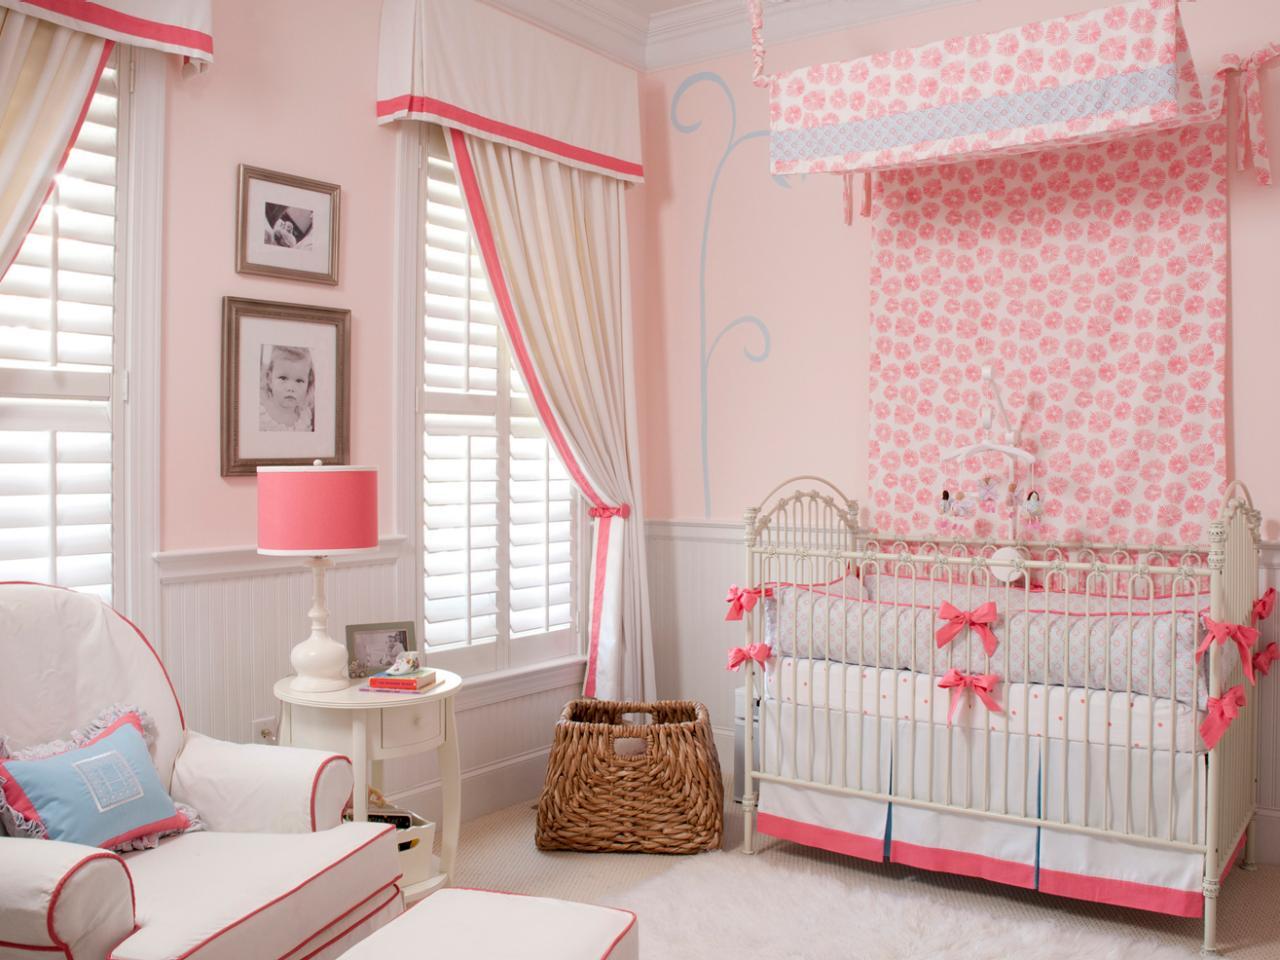 Original liz carroll pink girls nursery canopy 2 s4x3.jpg.rend.hgtvcom.1280.960